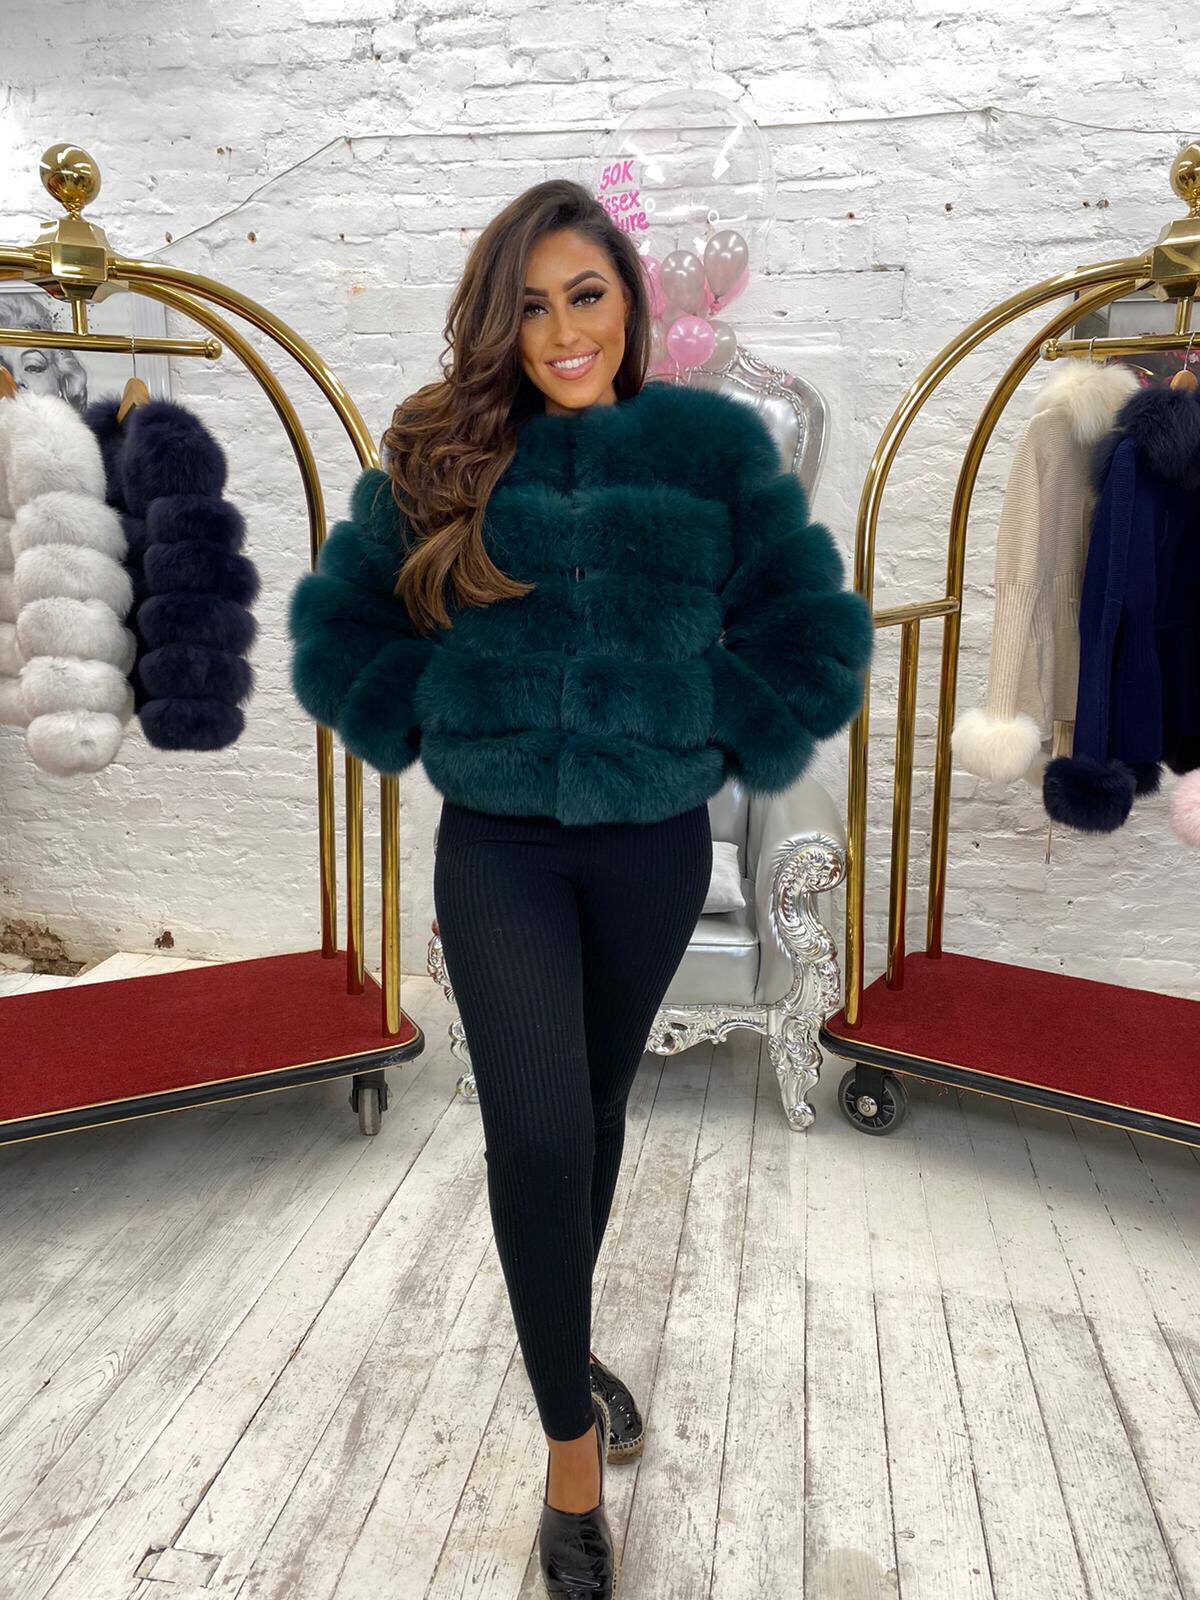 LIMITED EDITION Laura Jane Paris Fox Fur Coat in Royal Green